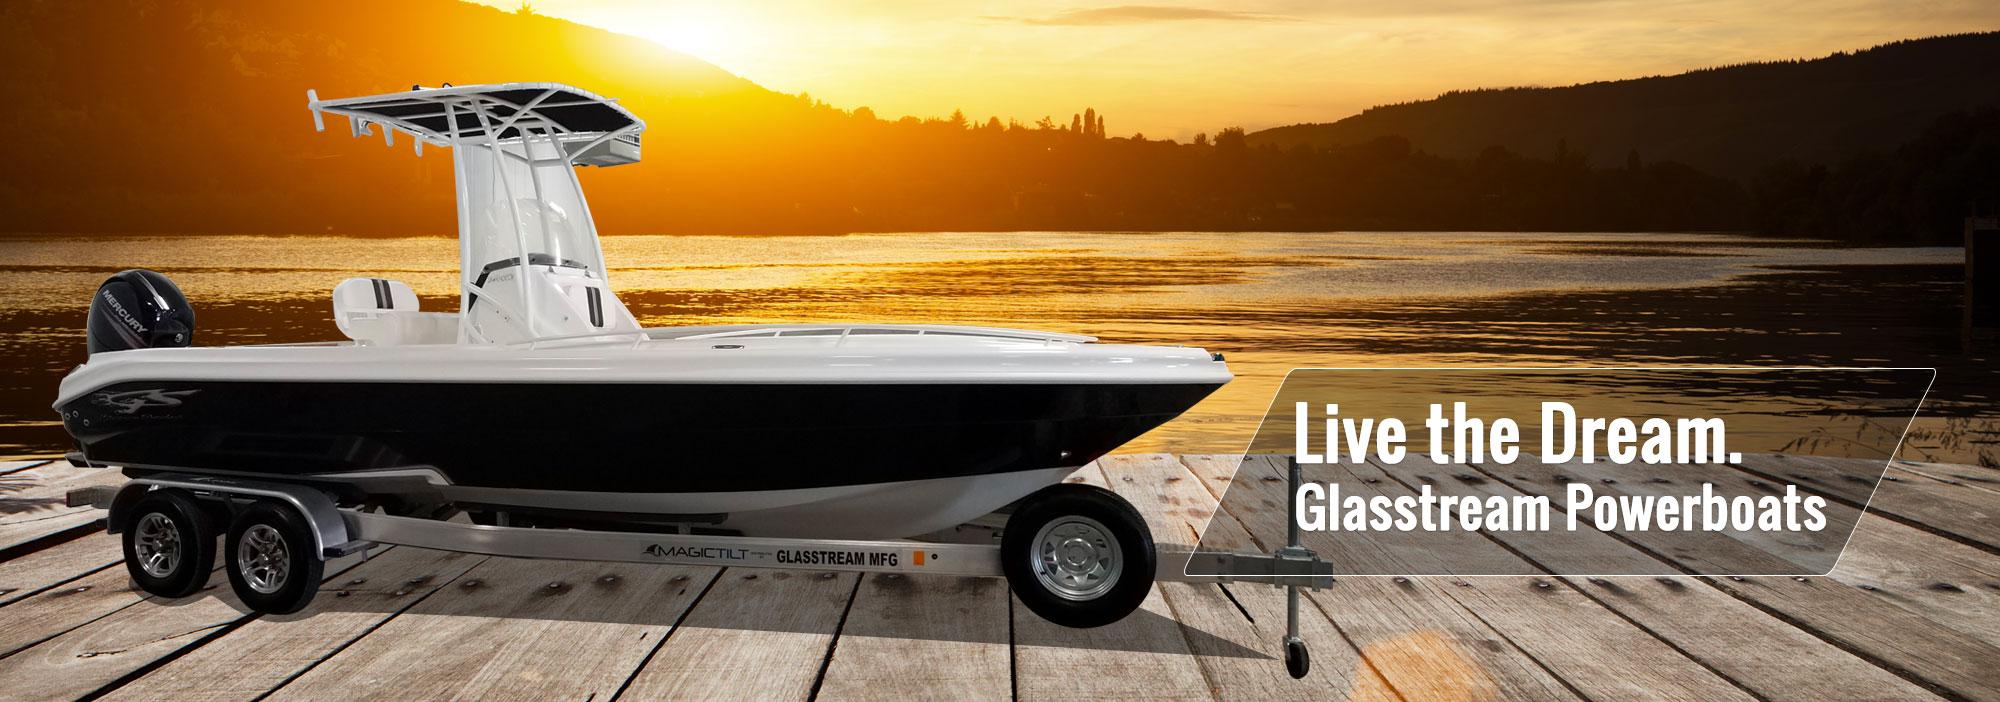 Glassstream CCX Boat